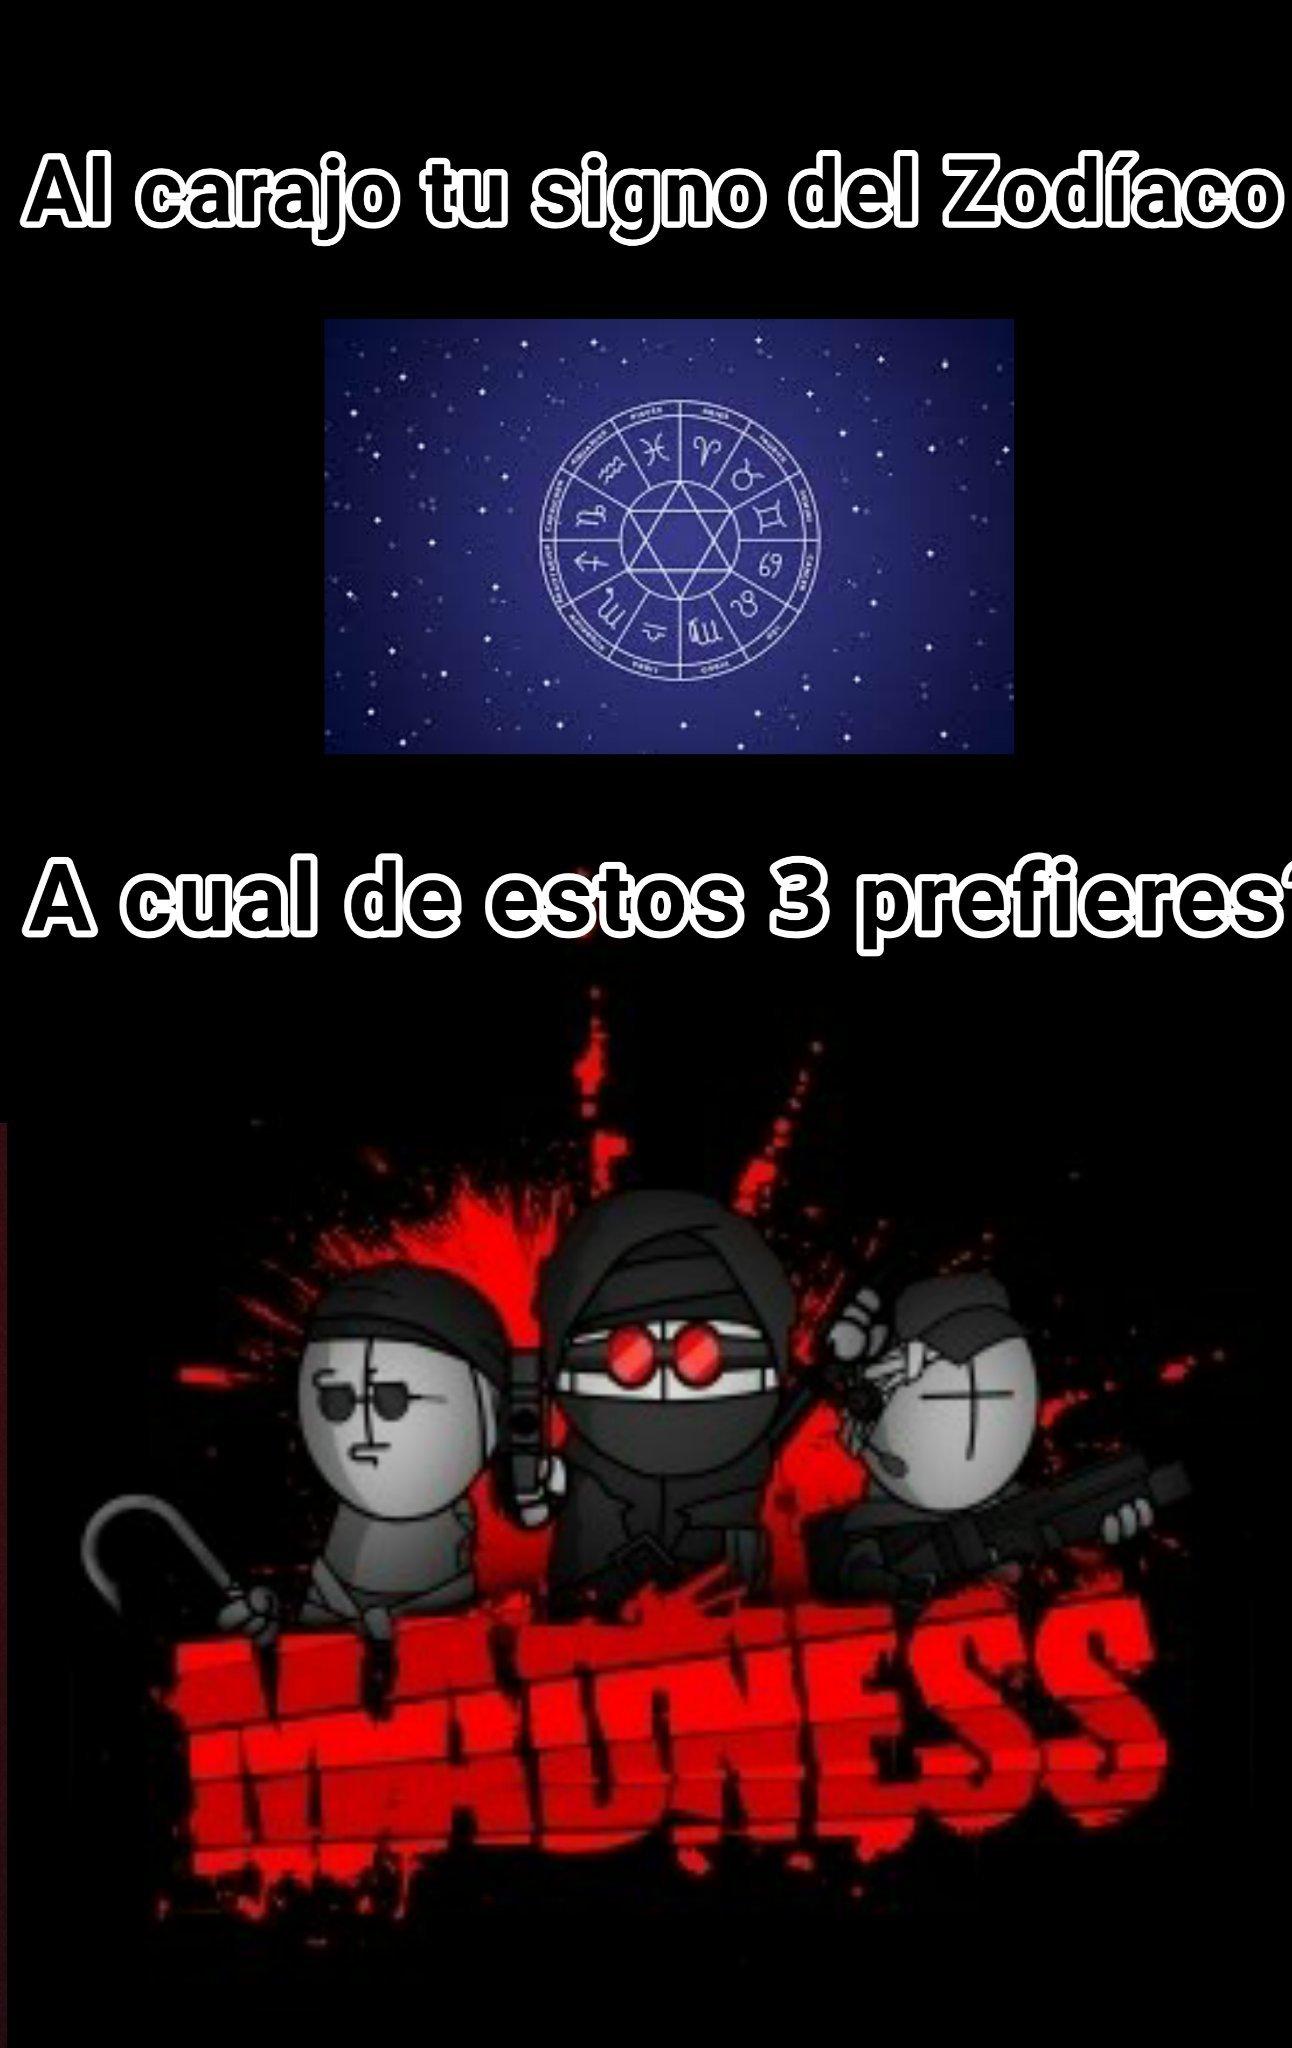 Madness combat - meme